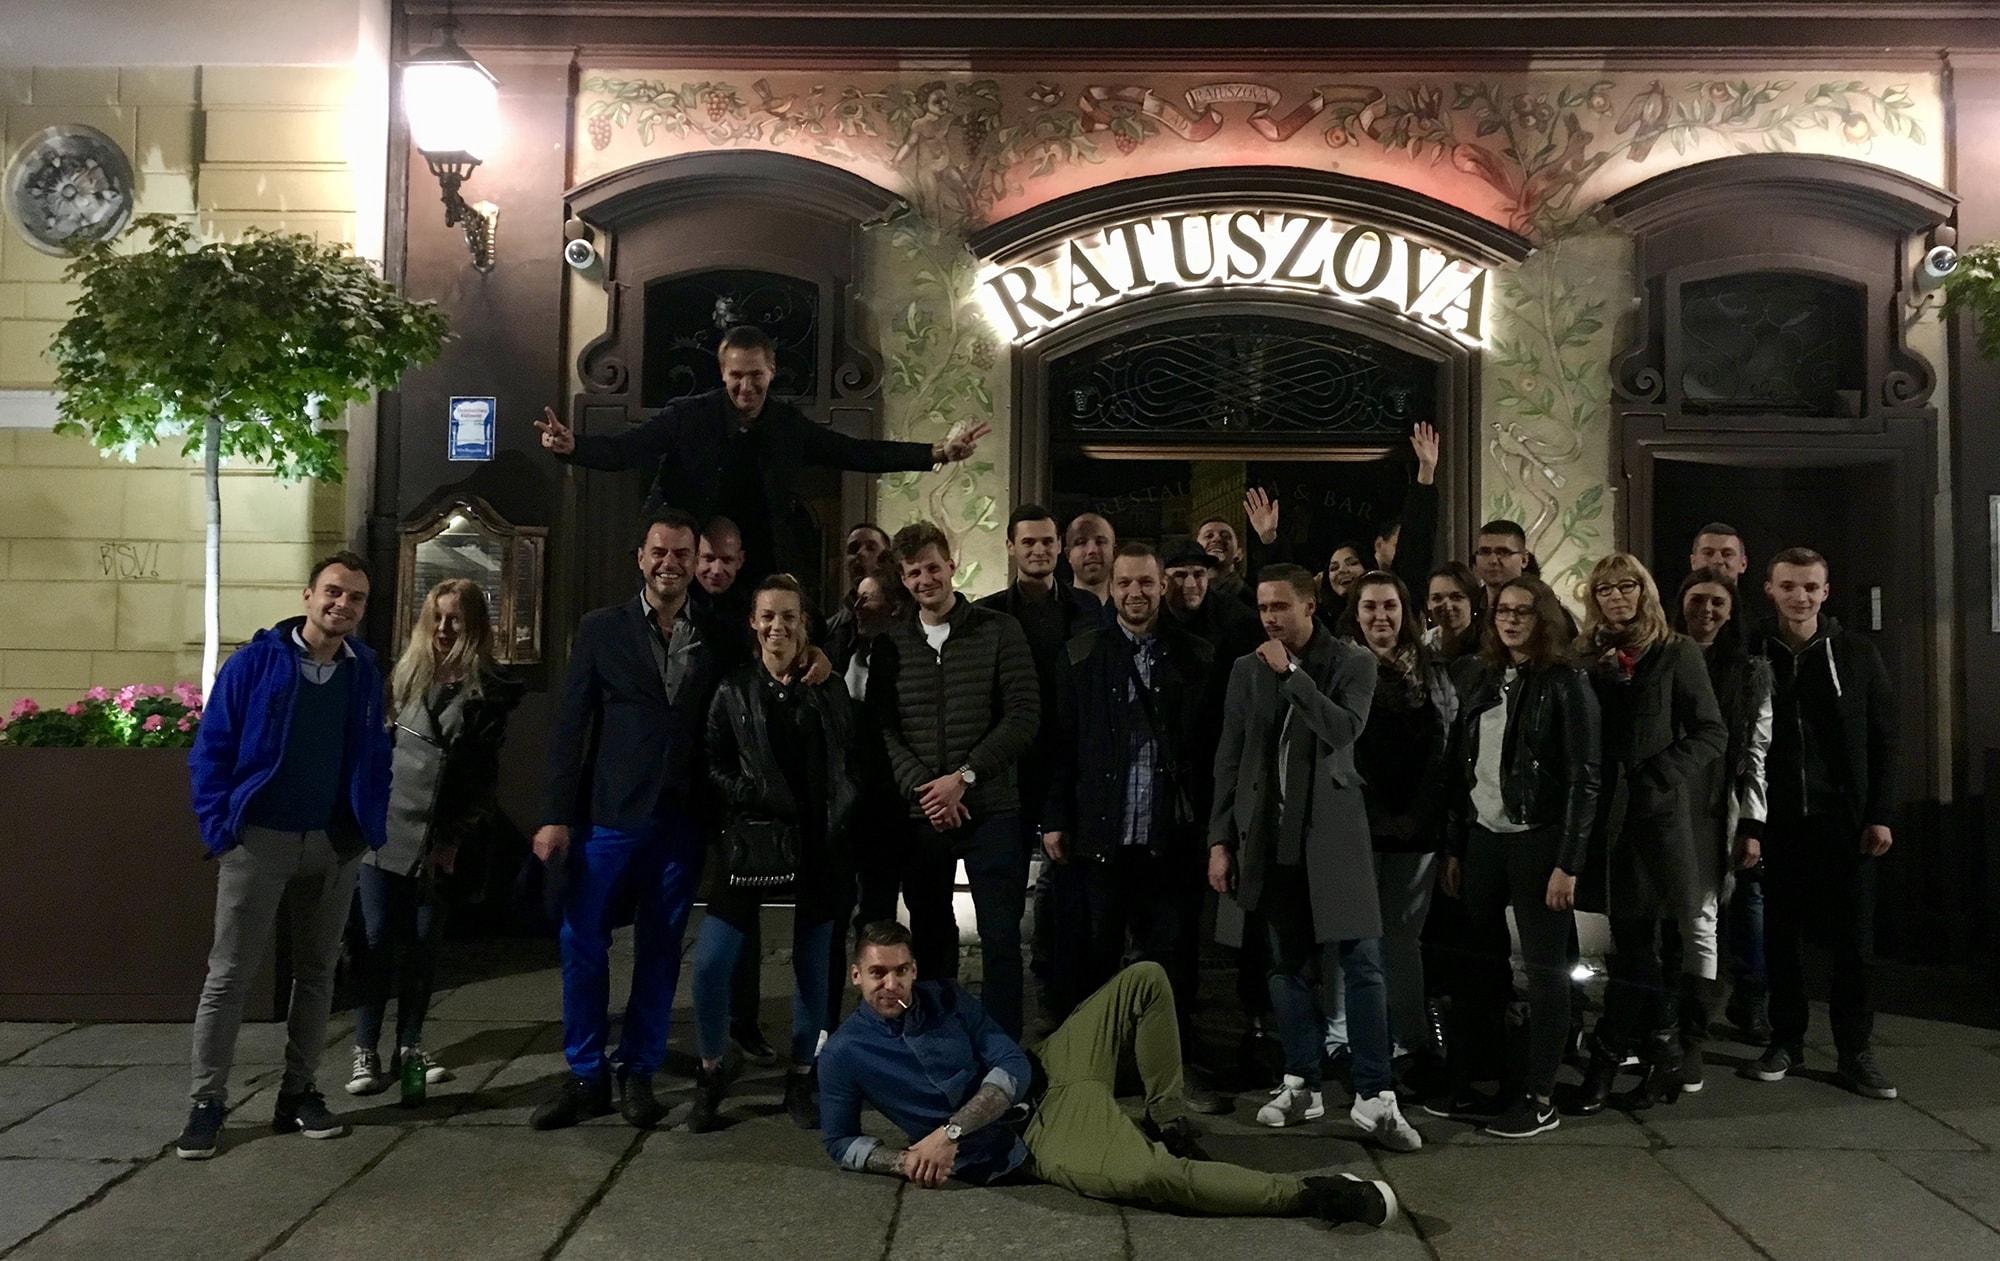 Ratuszova Team